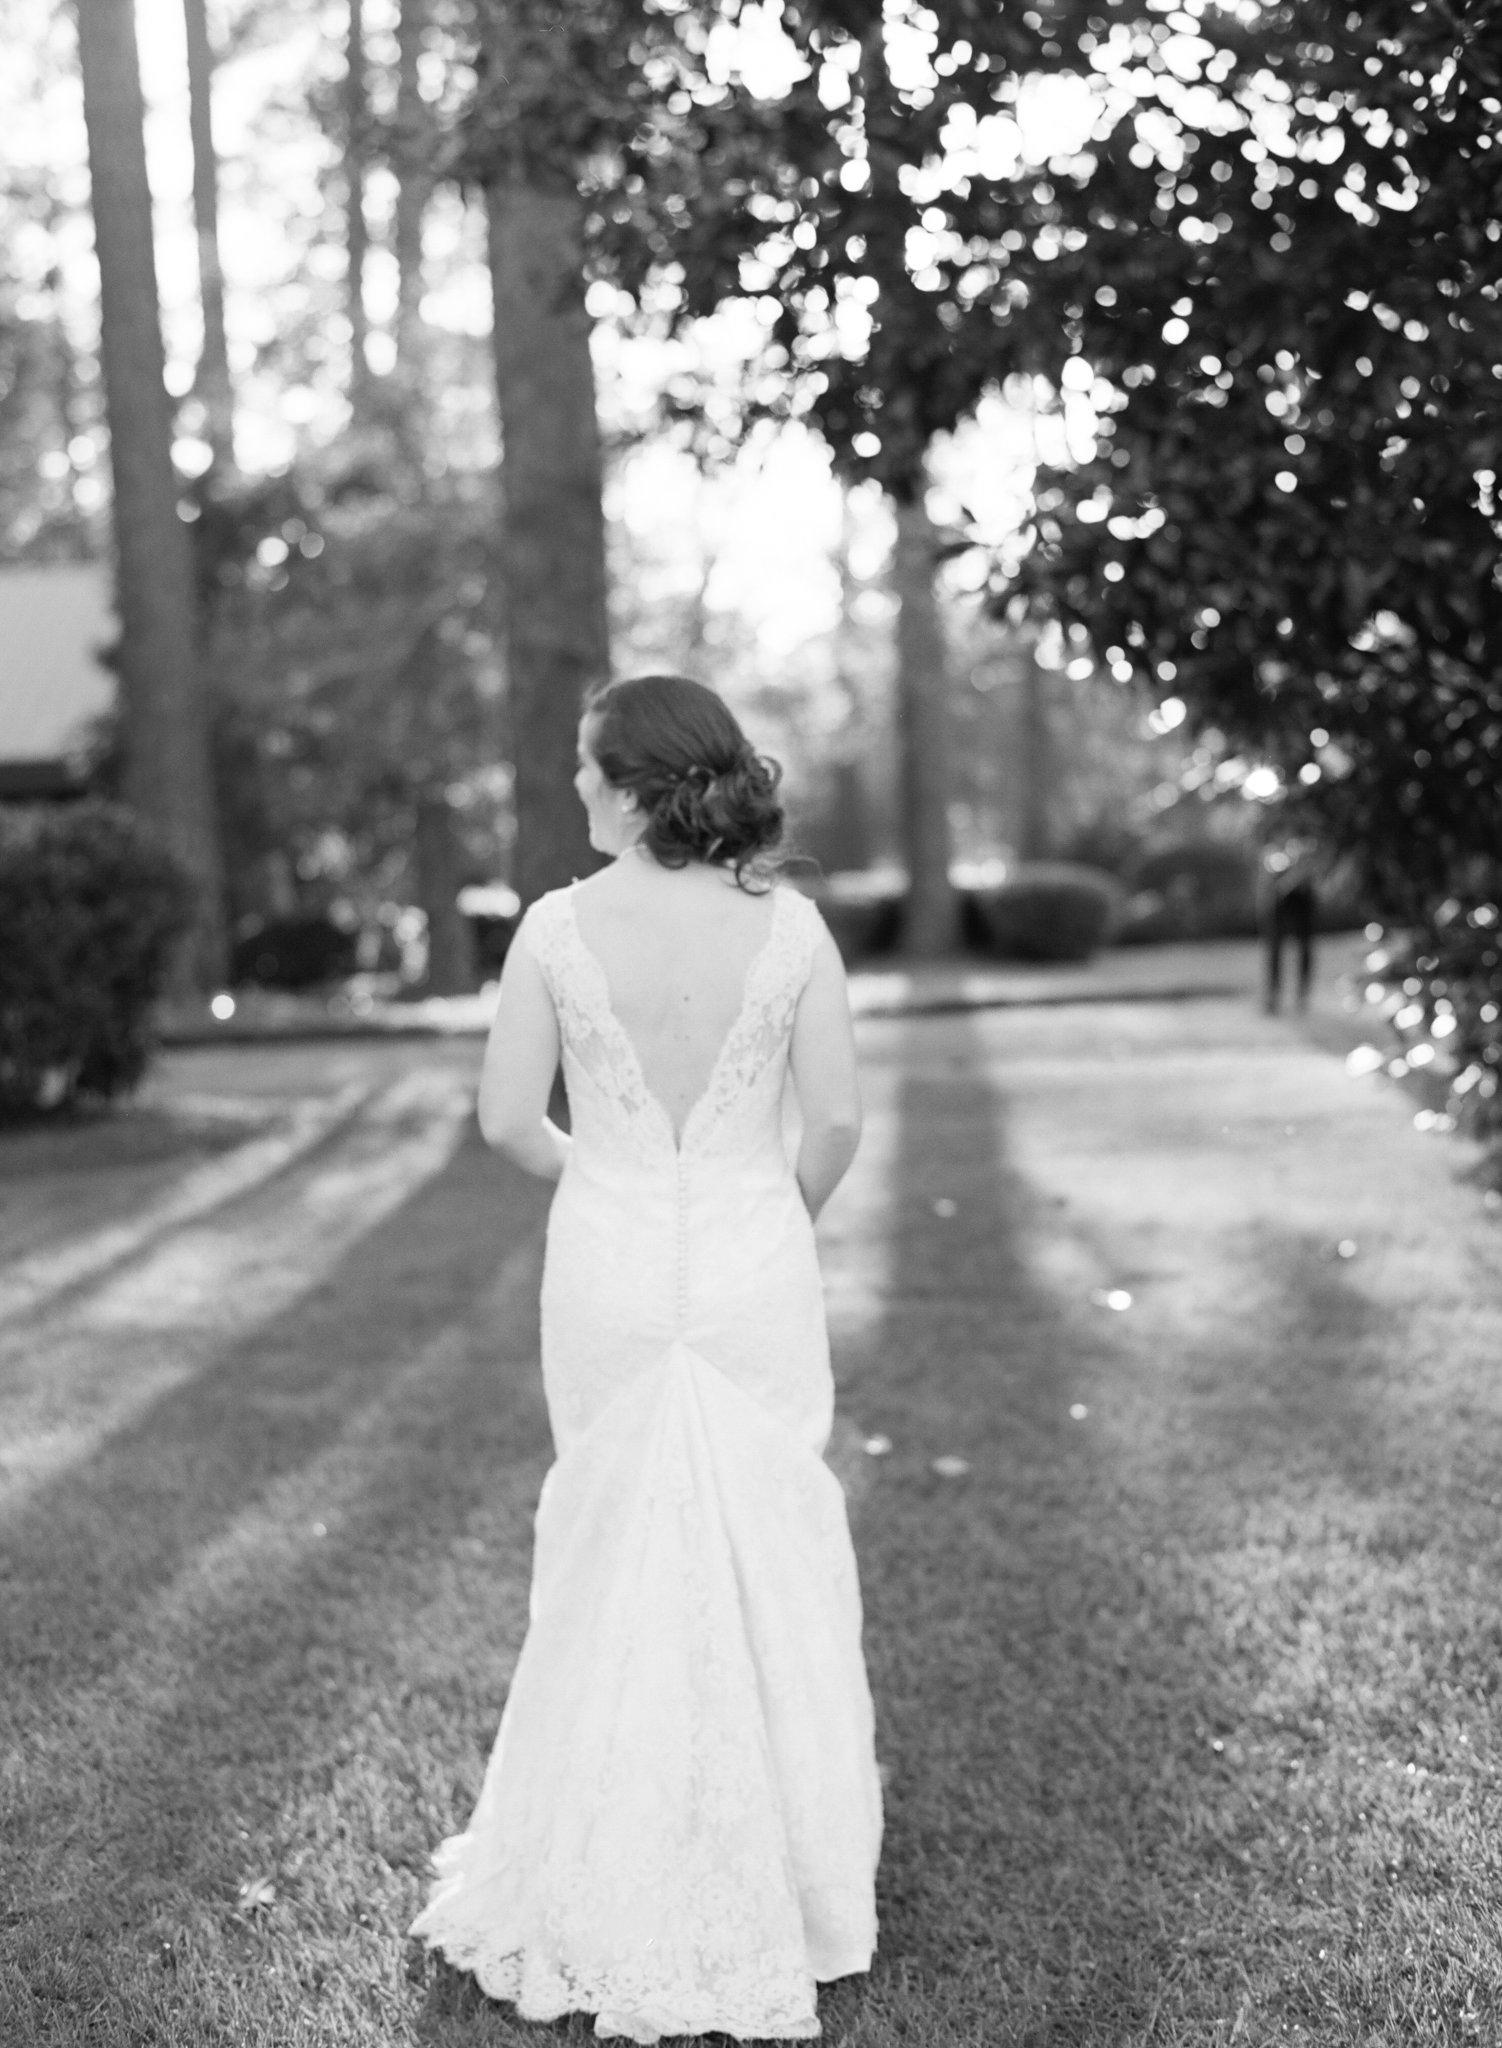 ecila farm wedding albany georgia wedding photographer shannon griffin photography-62.jpg